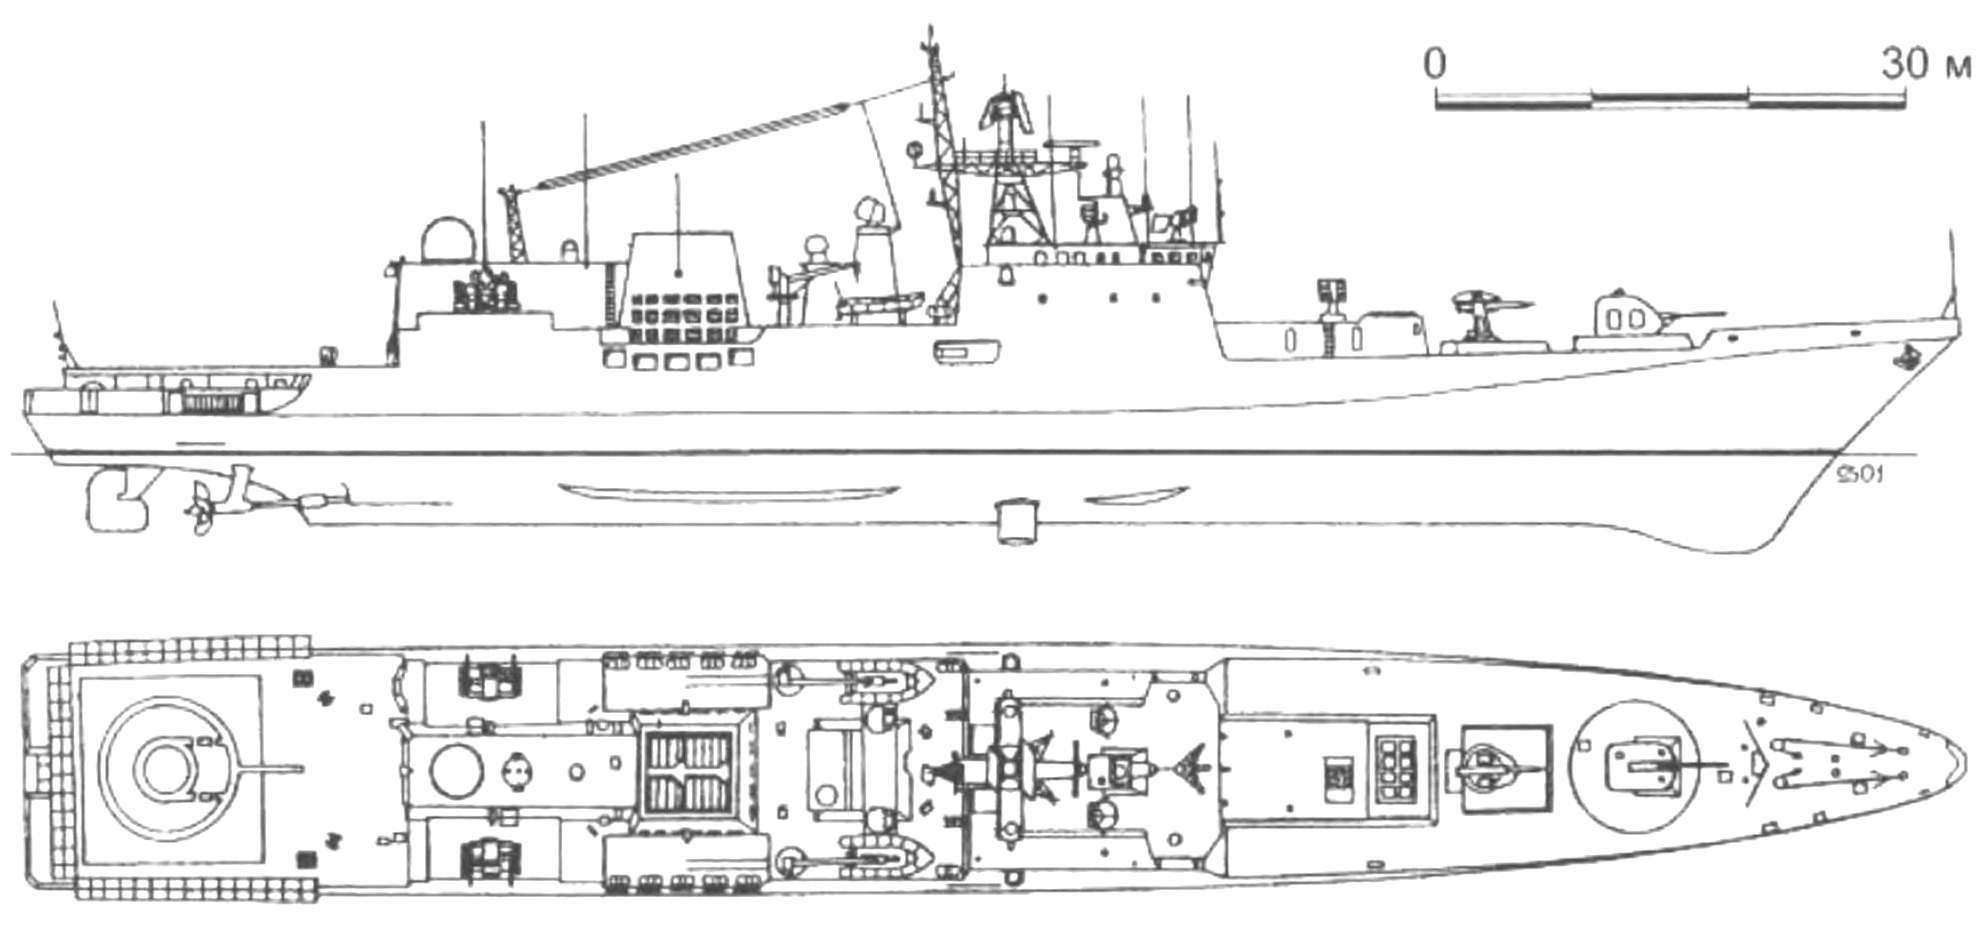 102. Фрегат «Тальвар» (проект 11356). Индия, 2003 г.